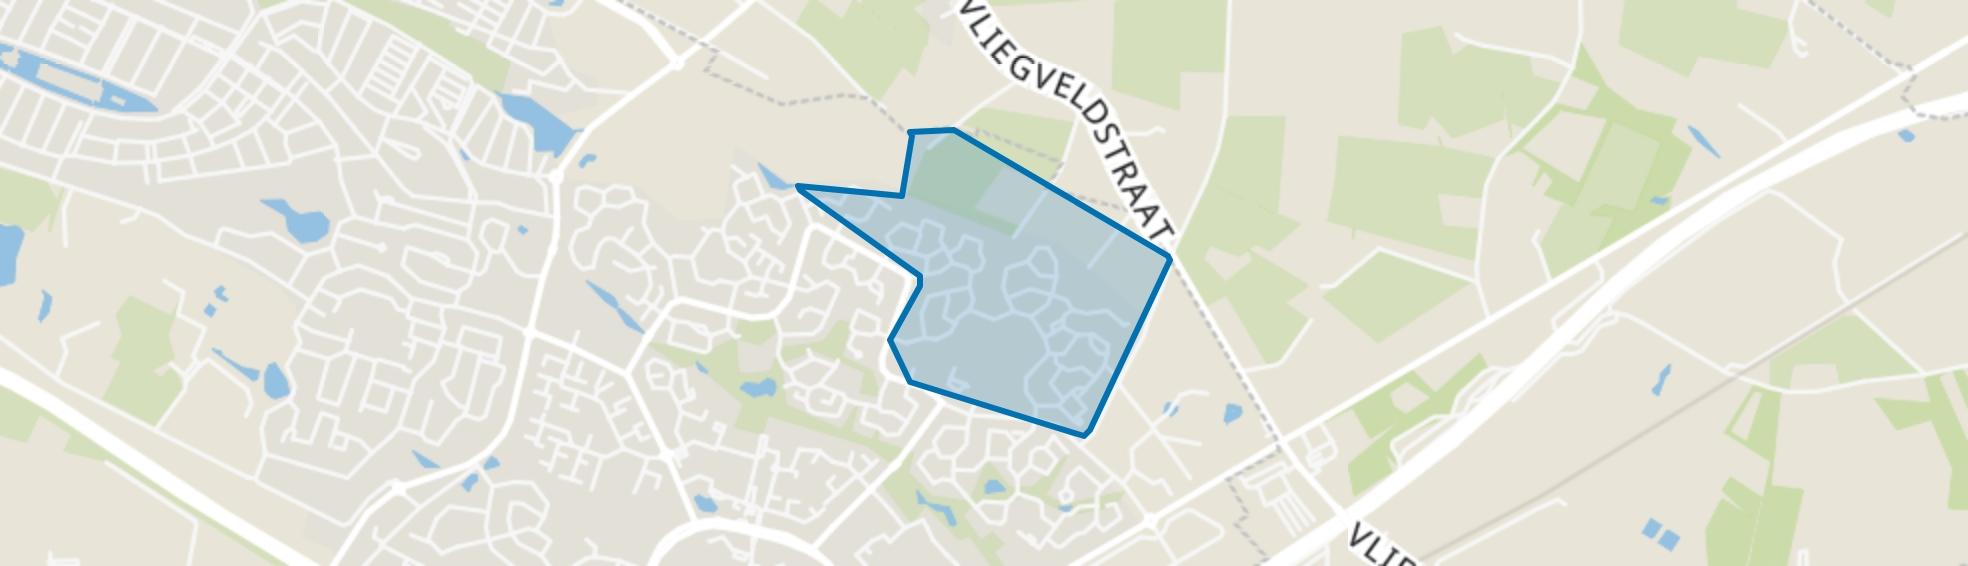 Bovenhoek, Hengelo (OV) map